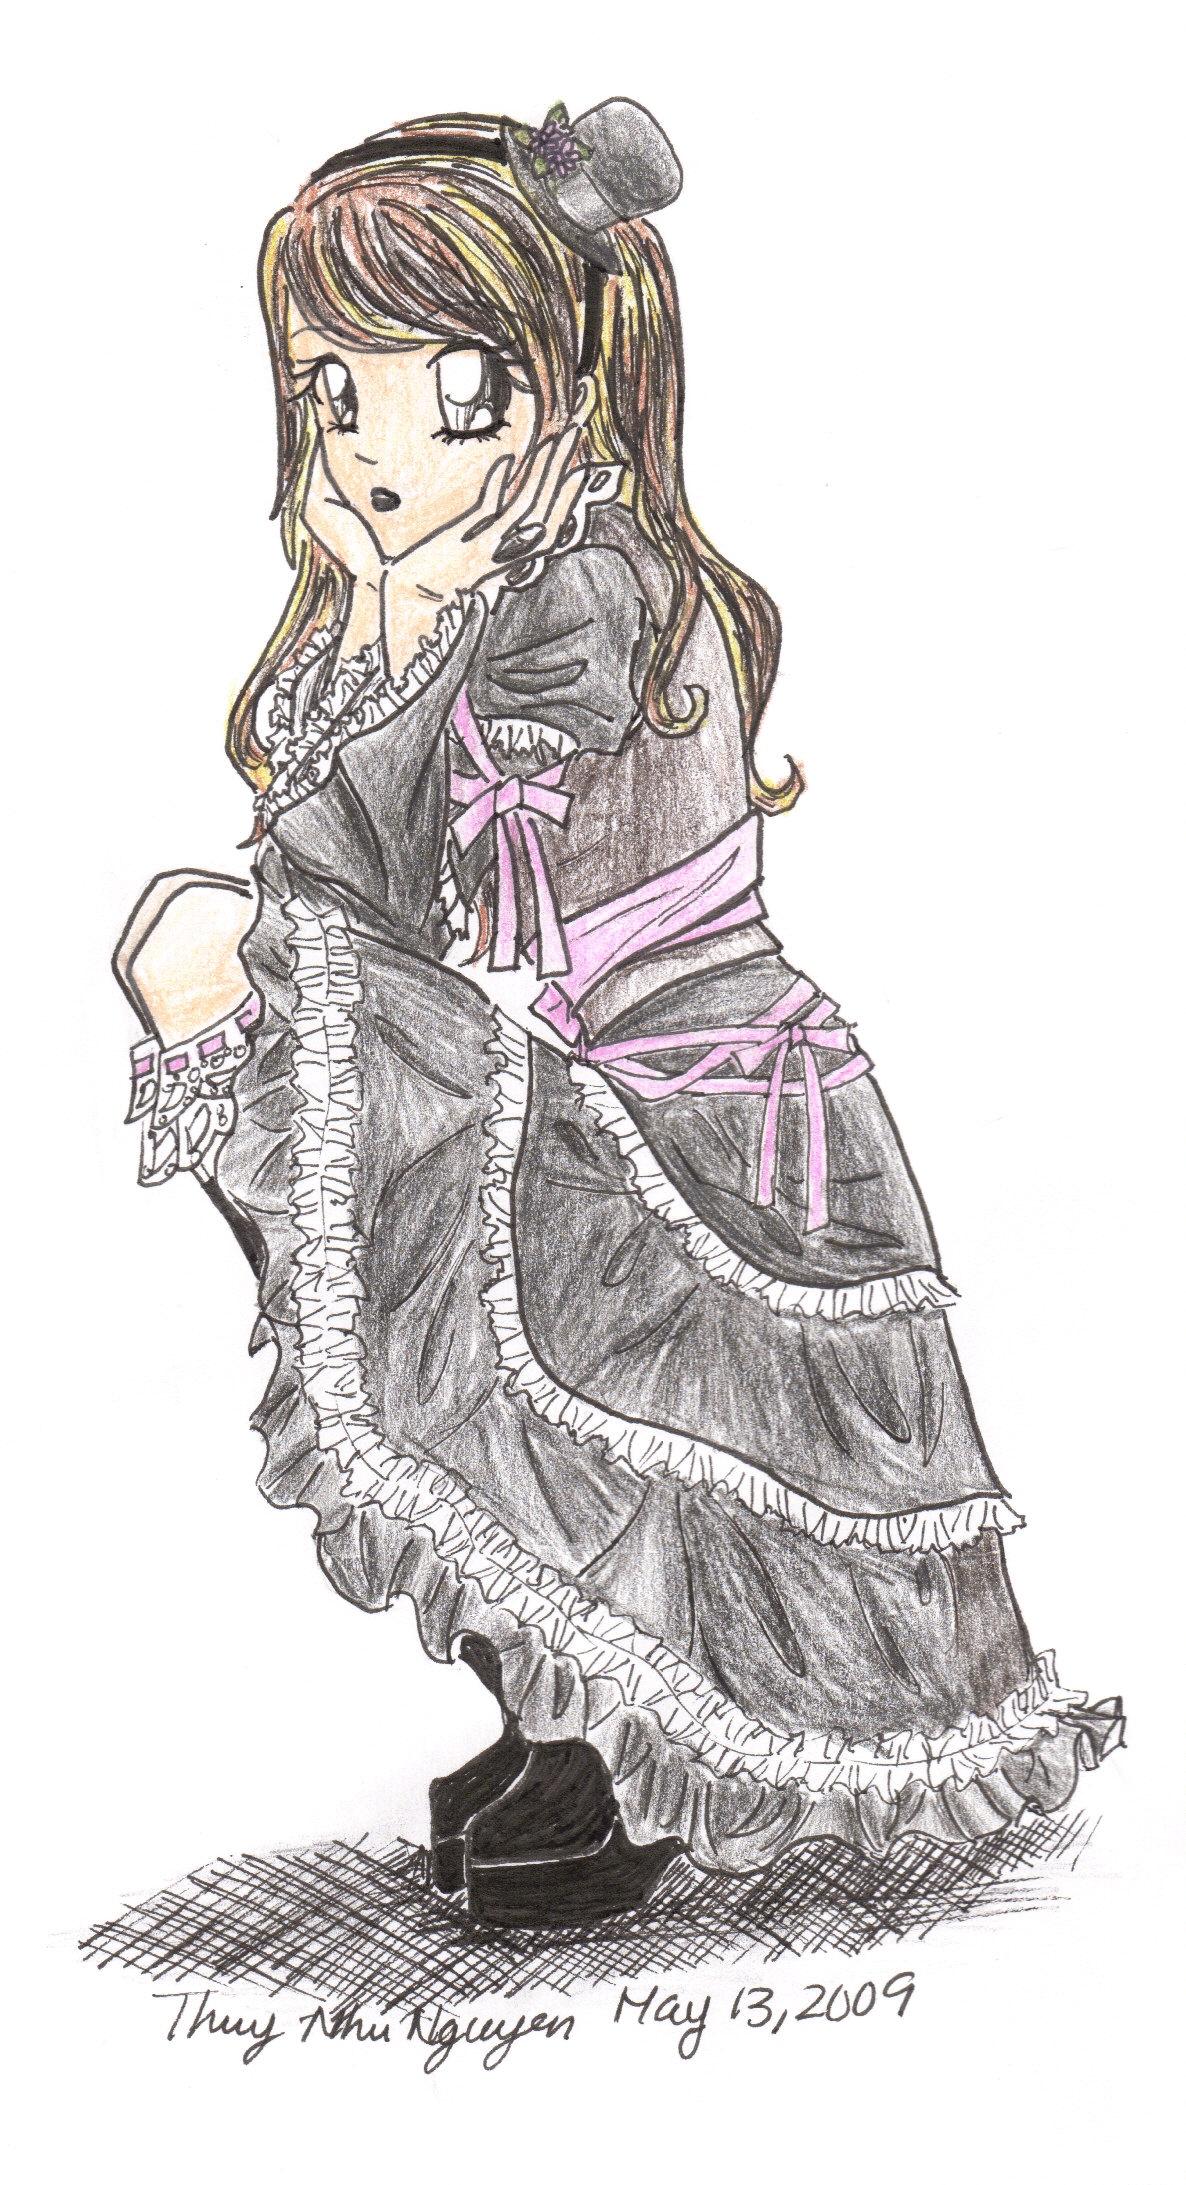 http://fc09.deviantart.net/fs27/f/2009/248/1/0/lolita_design_5_by_joongieluvr101.jpg